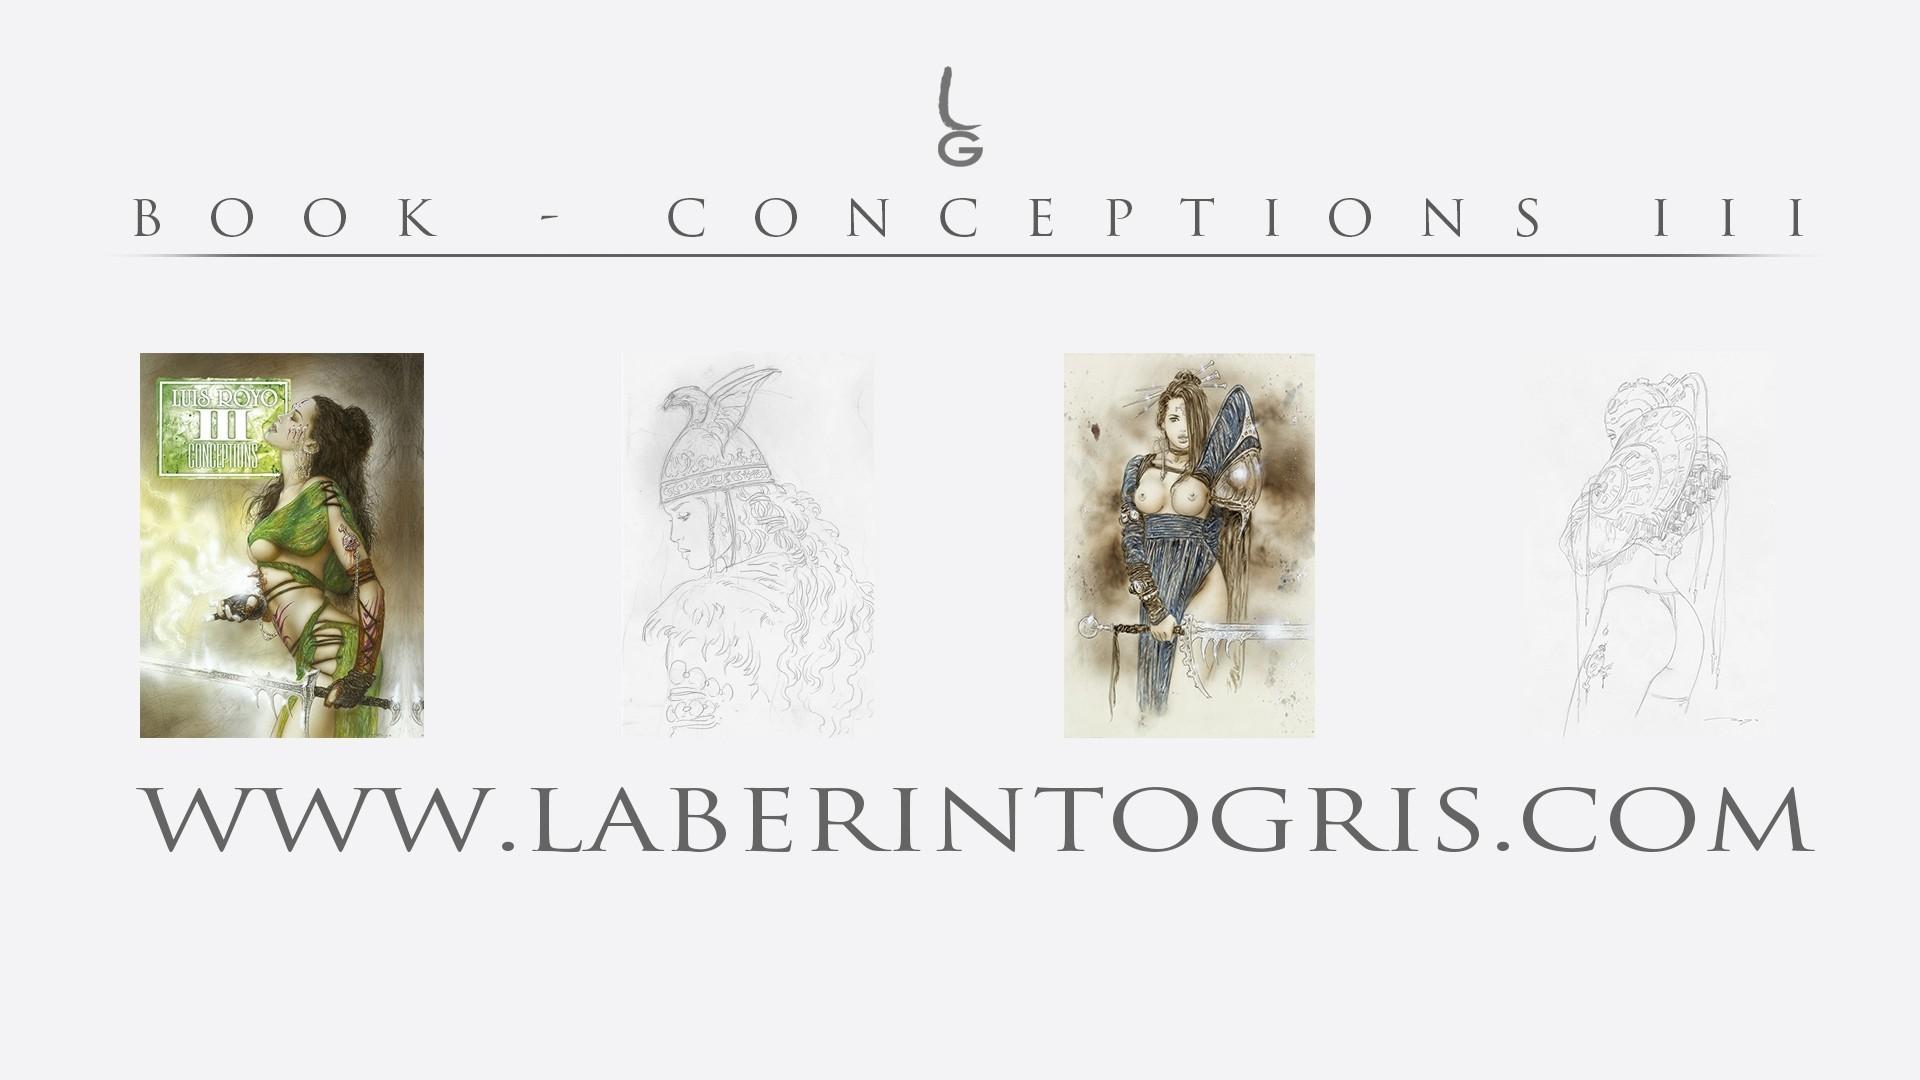 CONCEPTIONS III